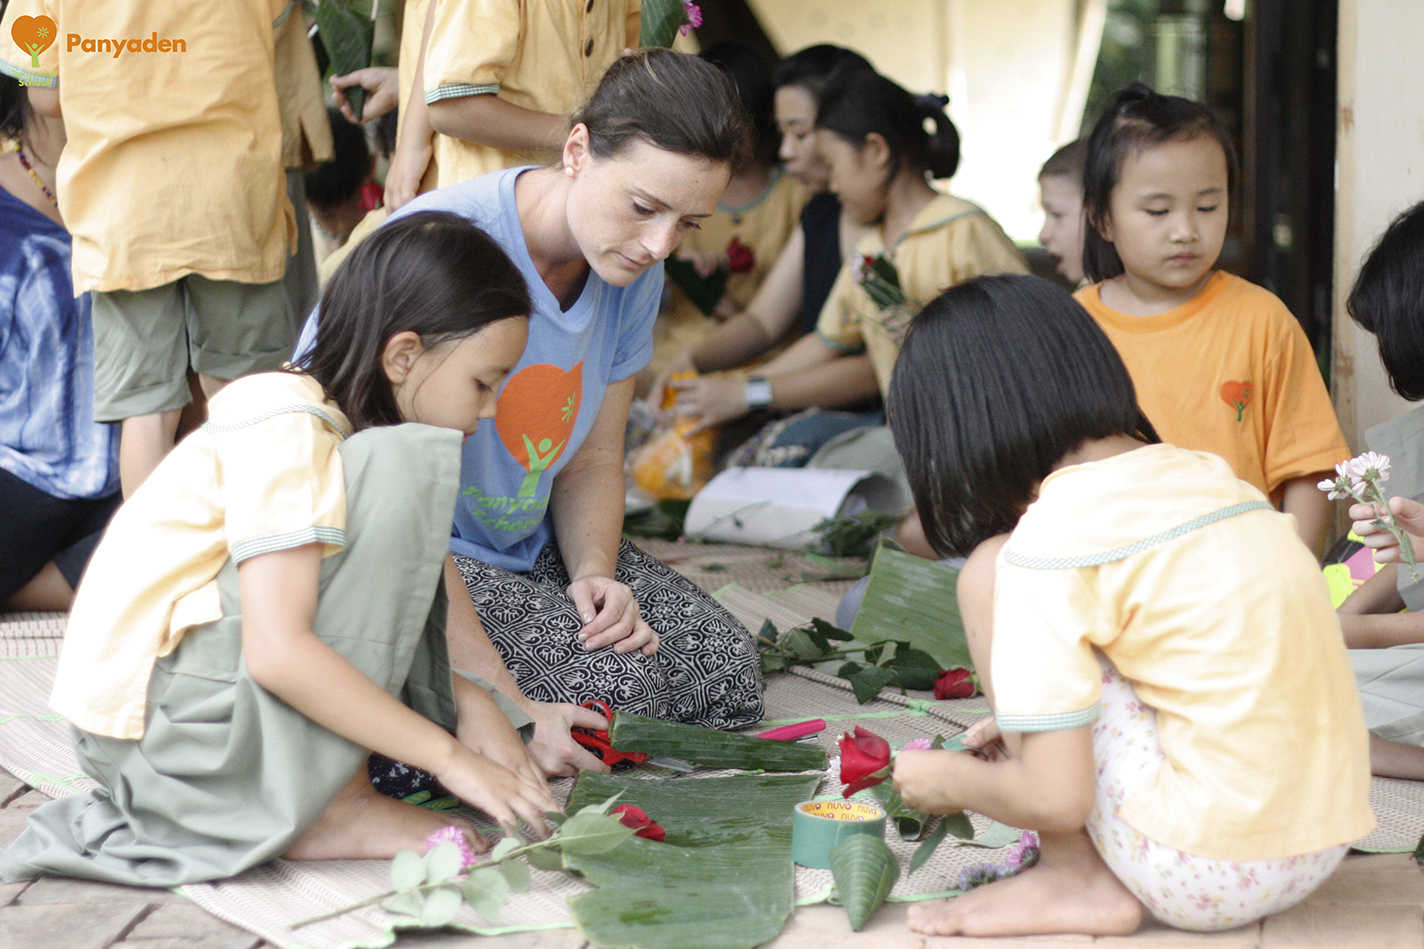 Panyaden Wai Kru Day 2017 preparation - Panyaden primary students cutting up banana leaves for flowers